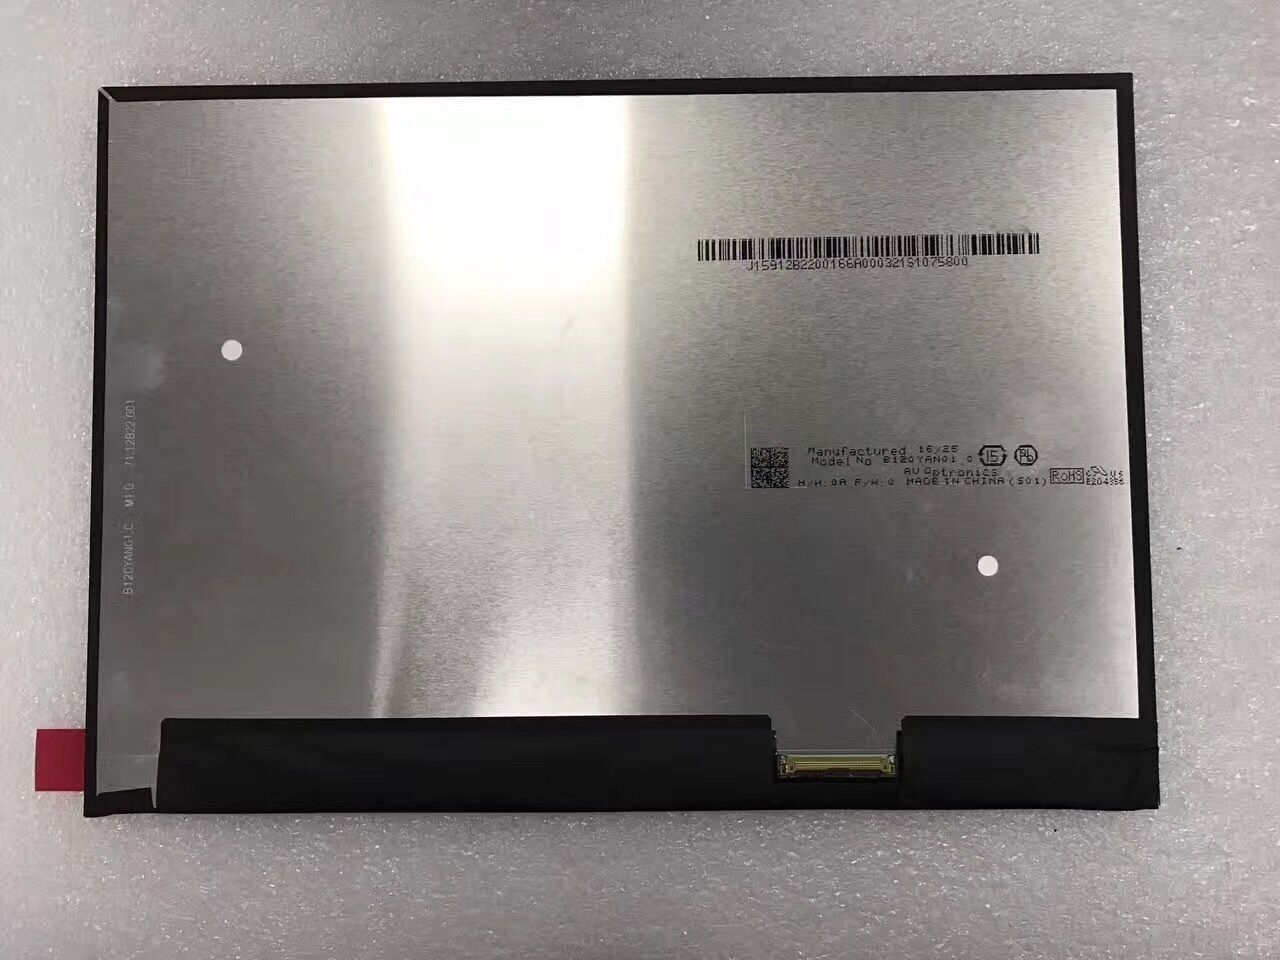 Pantalla LCD LED de 12,3 pulgadas B120YAN01.0 para Lenovo Miix 720 2880x1920 sin tocar